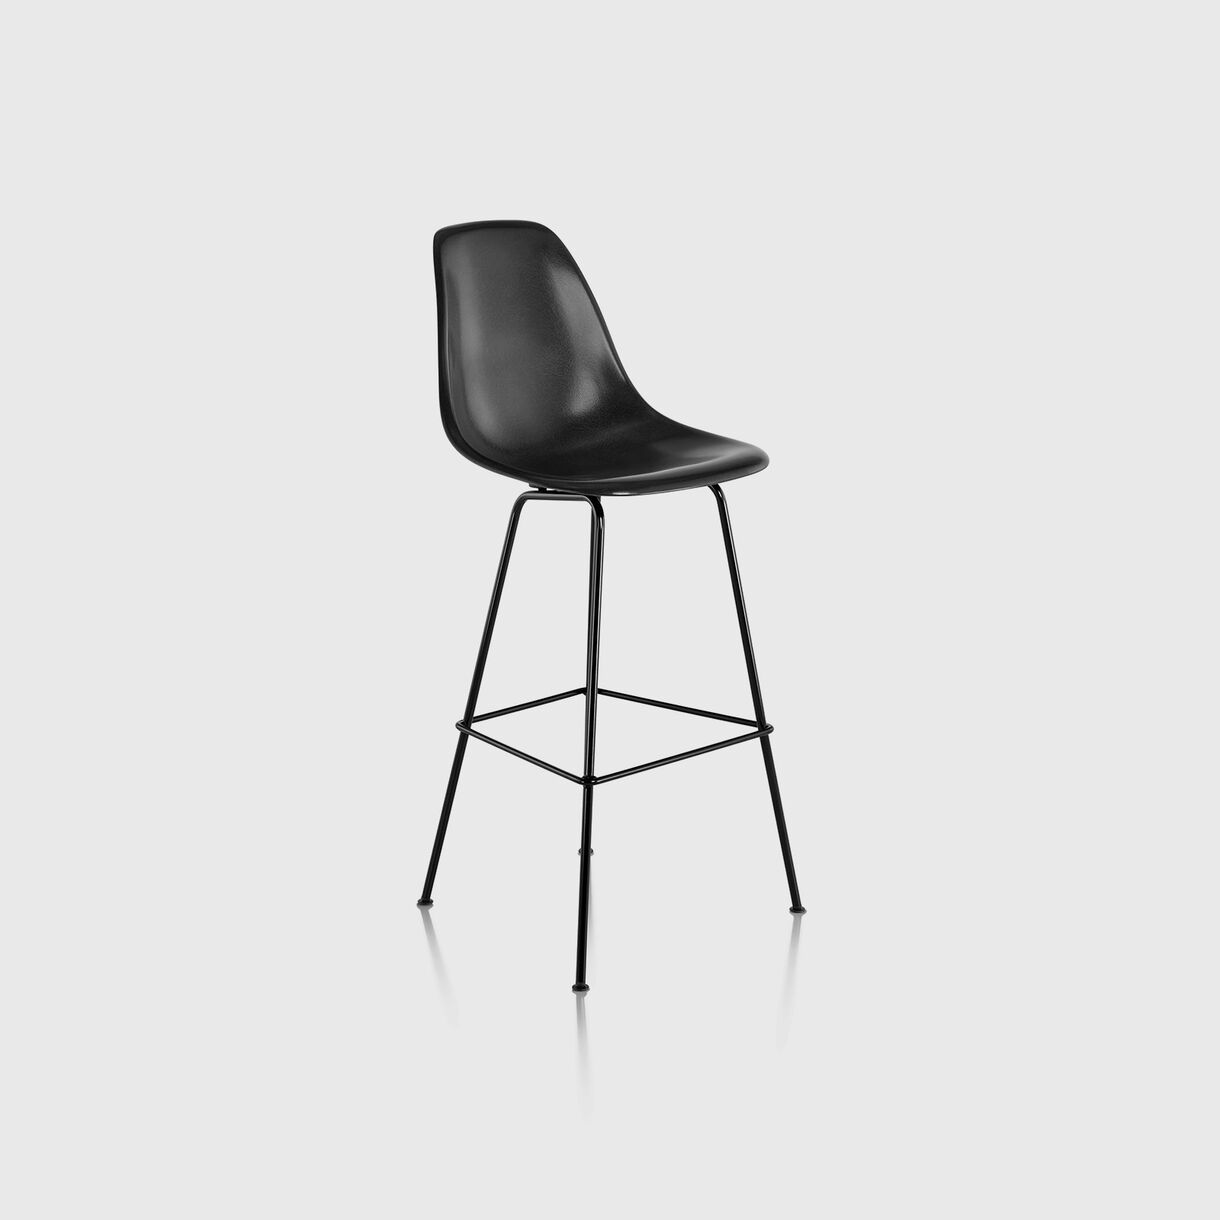 Eames Moulded Fibreglass Bar Stool, Black